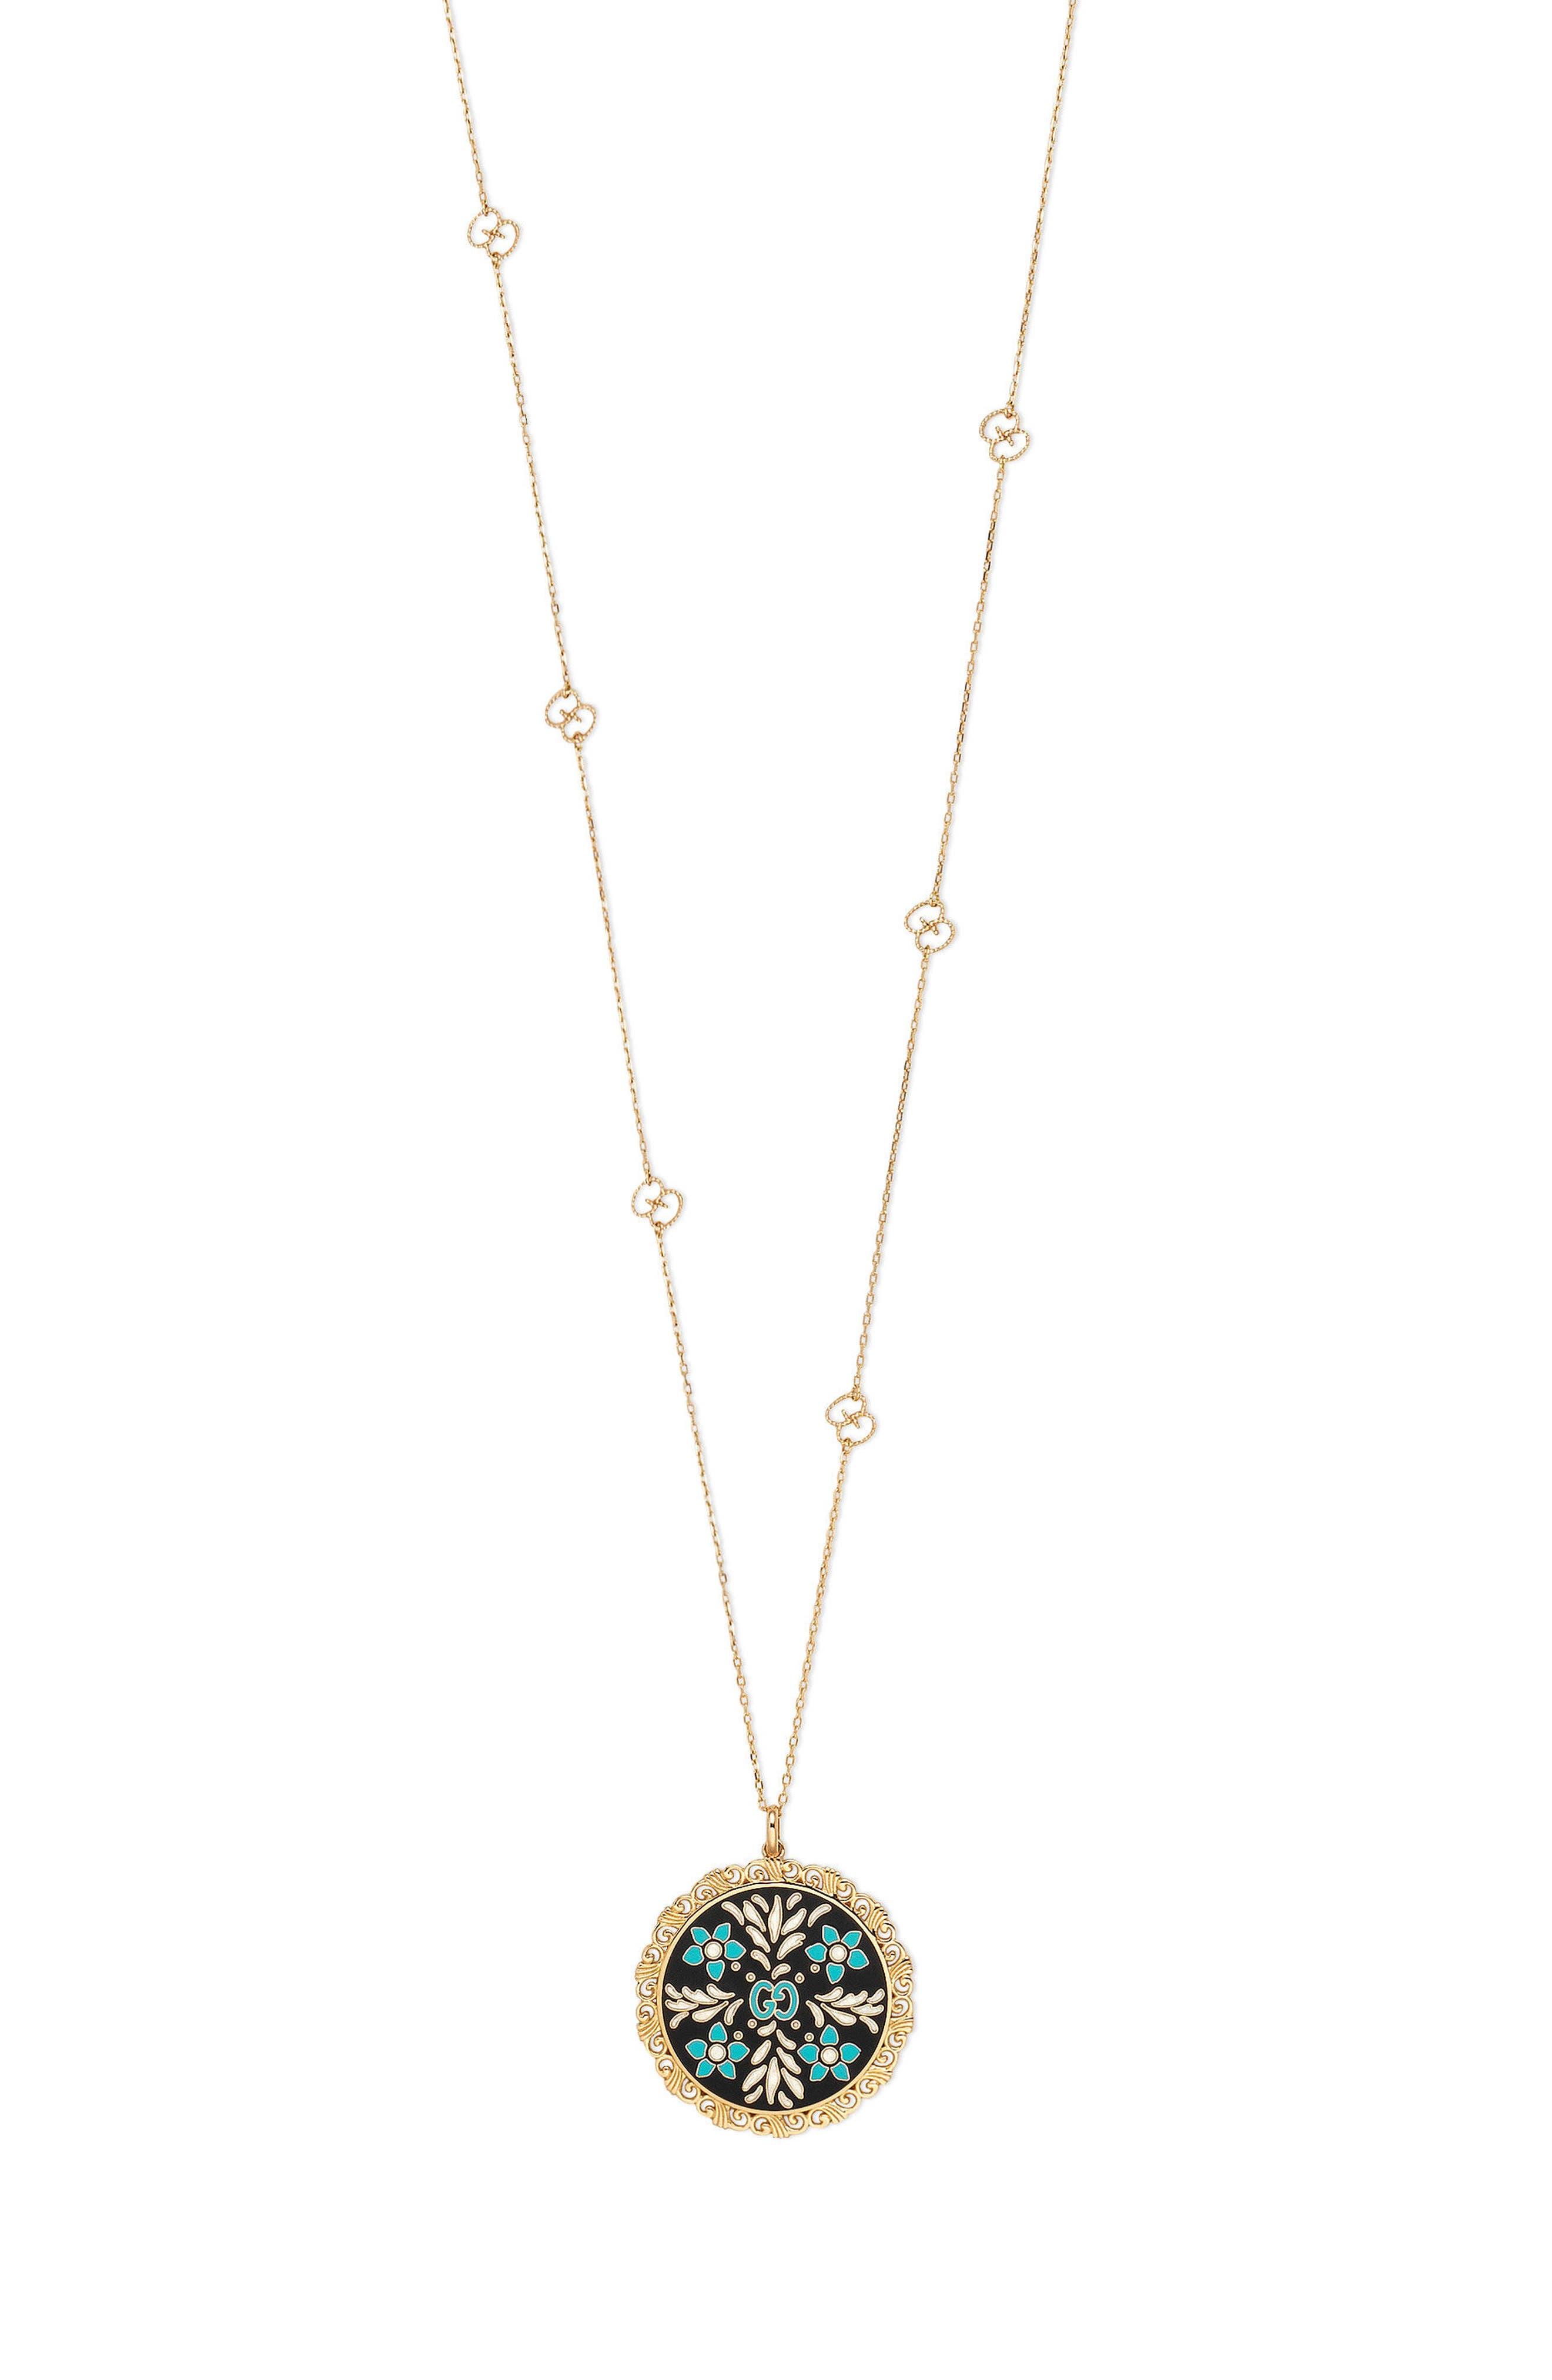 Icon Blooms Enamel Pendant Necklace,                             Main thumbnail 1, color,                             YELLOW GOLD